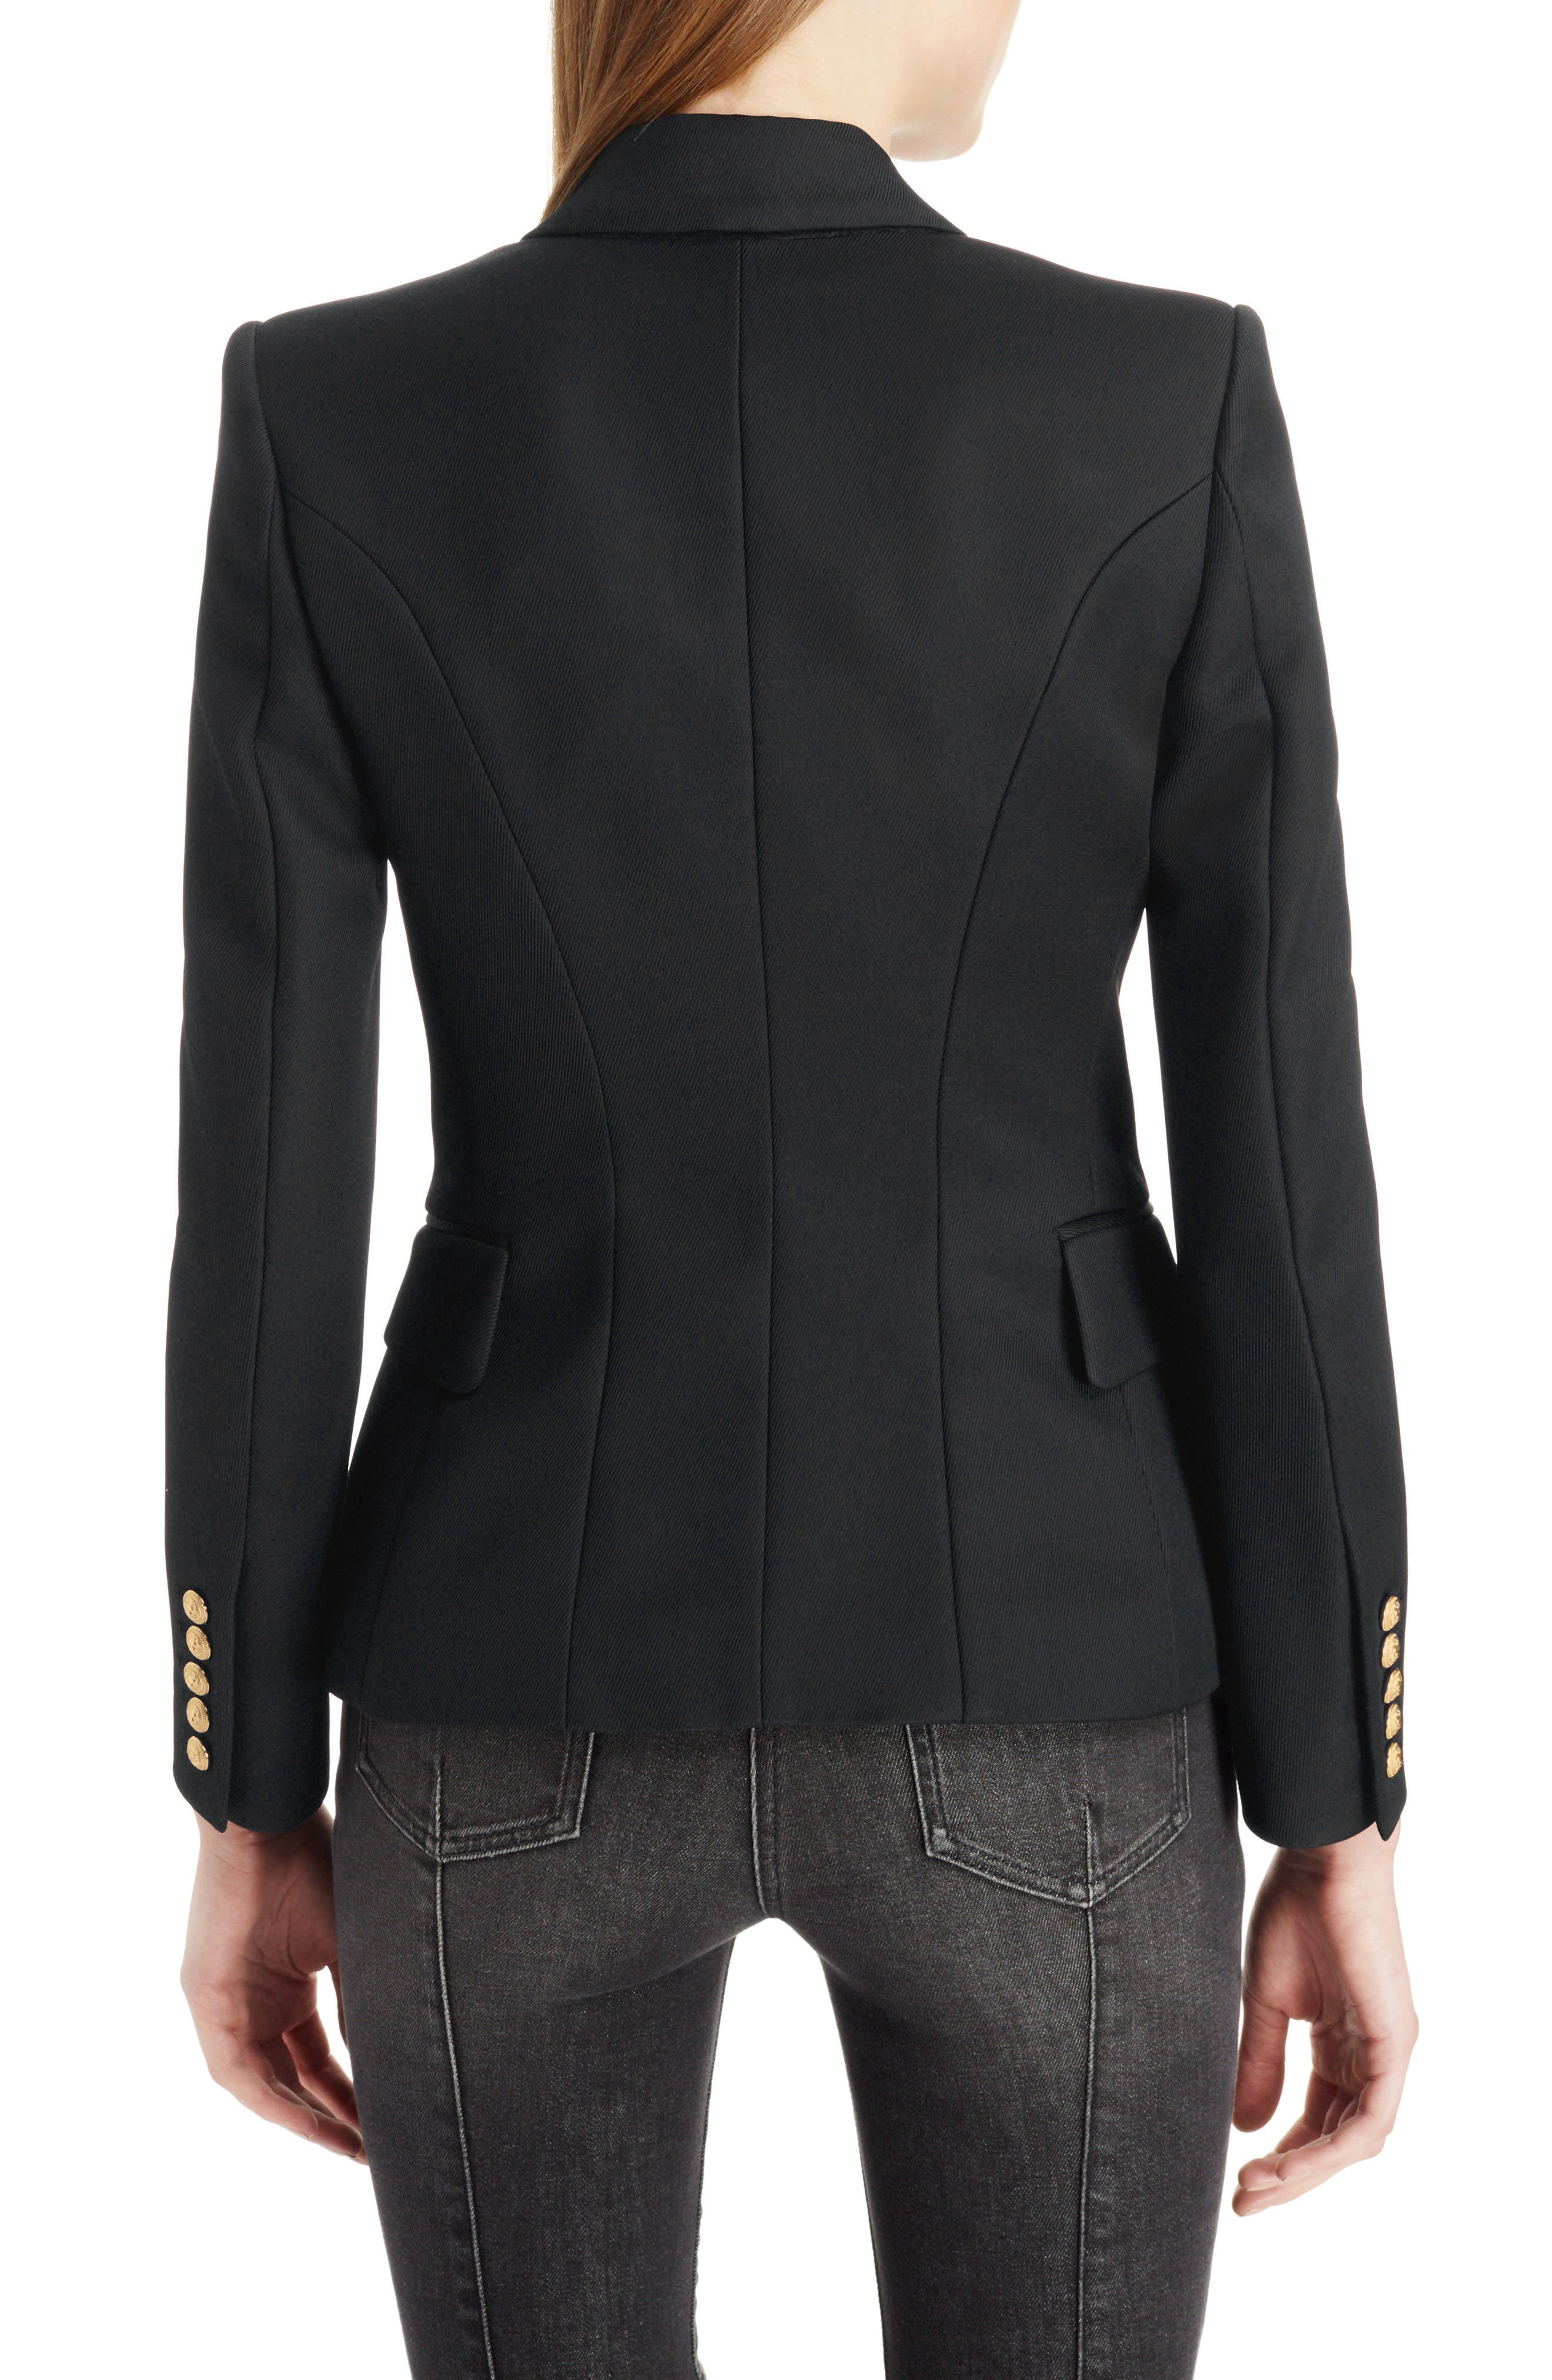 BALMAIN, Double Breasted Wool Blazer, Alternate thumbnail 2, color, BLACK/GOLD